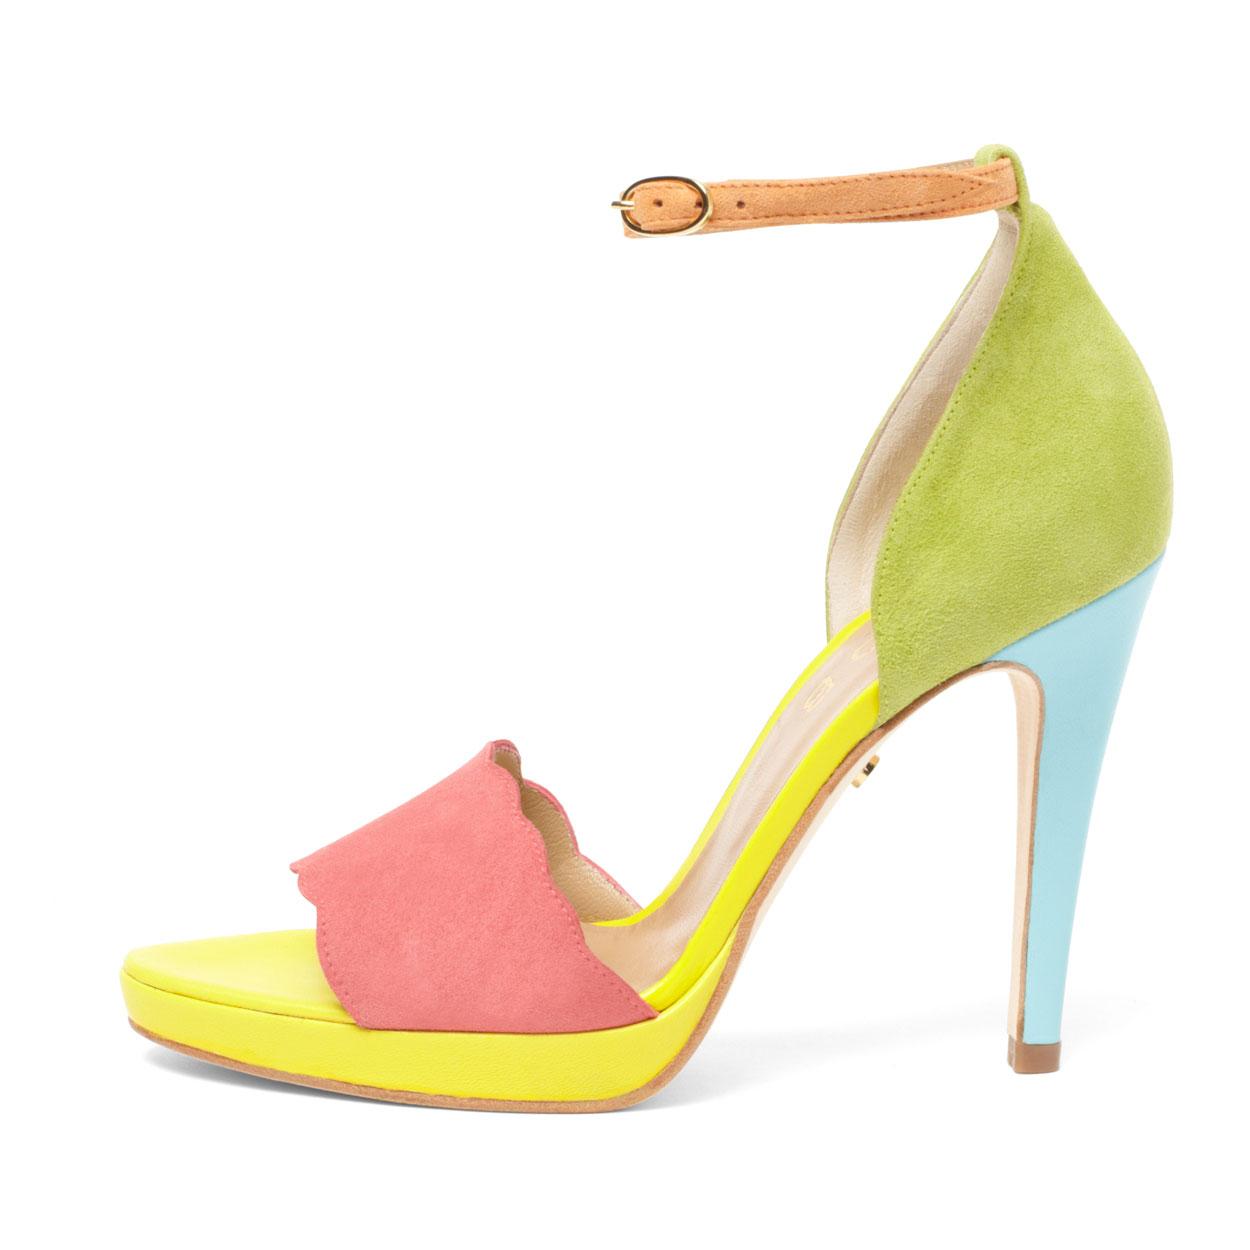 pepper-multi-side-colour-neon-luxury-heel-sandal.jpg